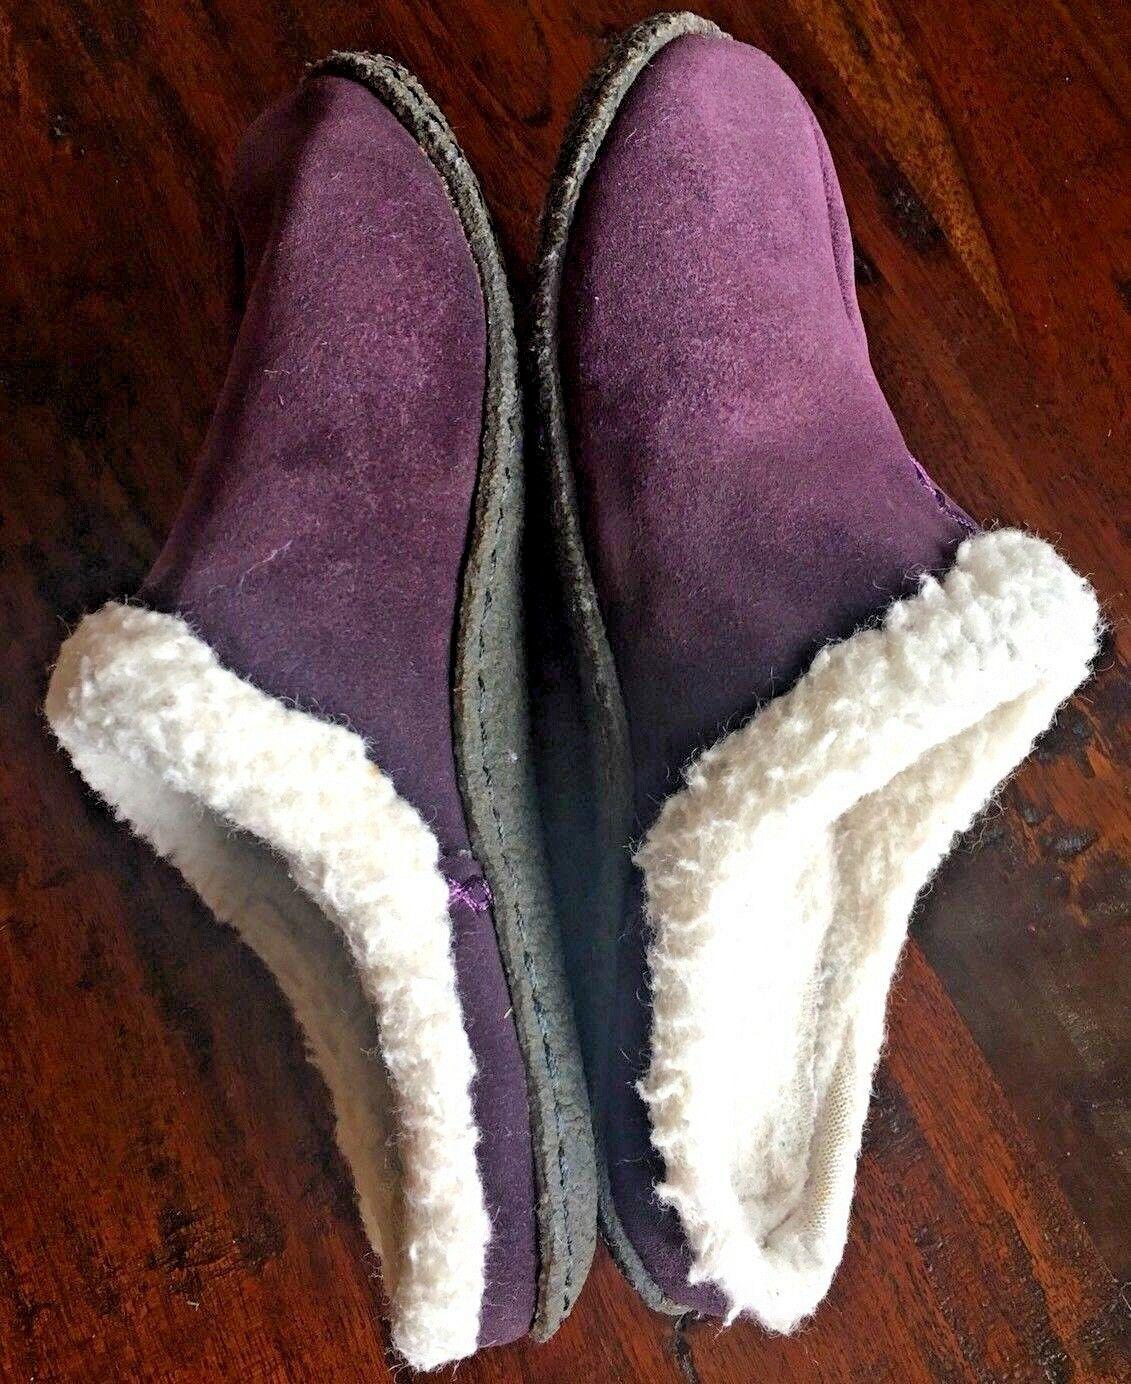 SOREL 9381 Womens Nakiska LILAC Purple Suede Clog Slippers Shoes 6 M #176 image 6